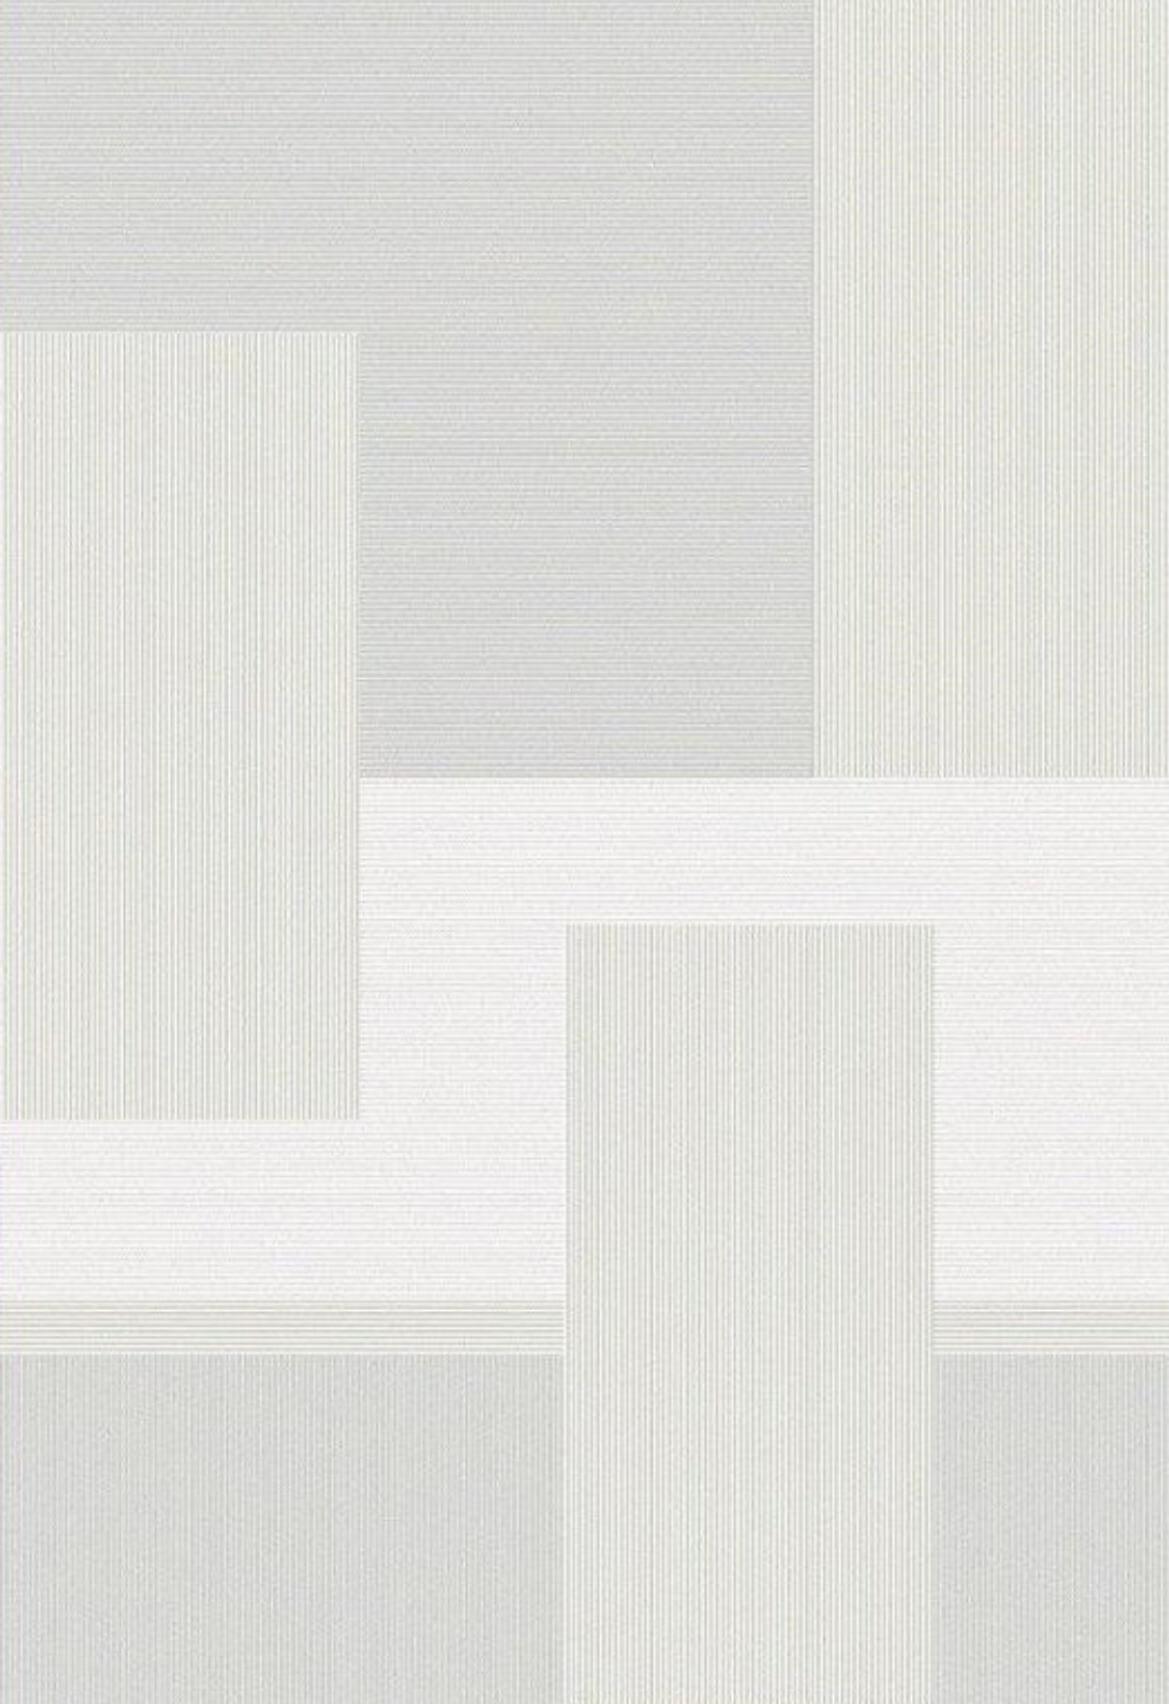 WOOLKNOT HALI BRİGHT M496A Woolknot Halı Bambu Halı